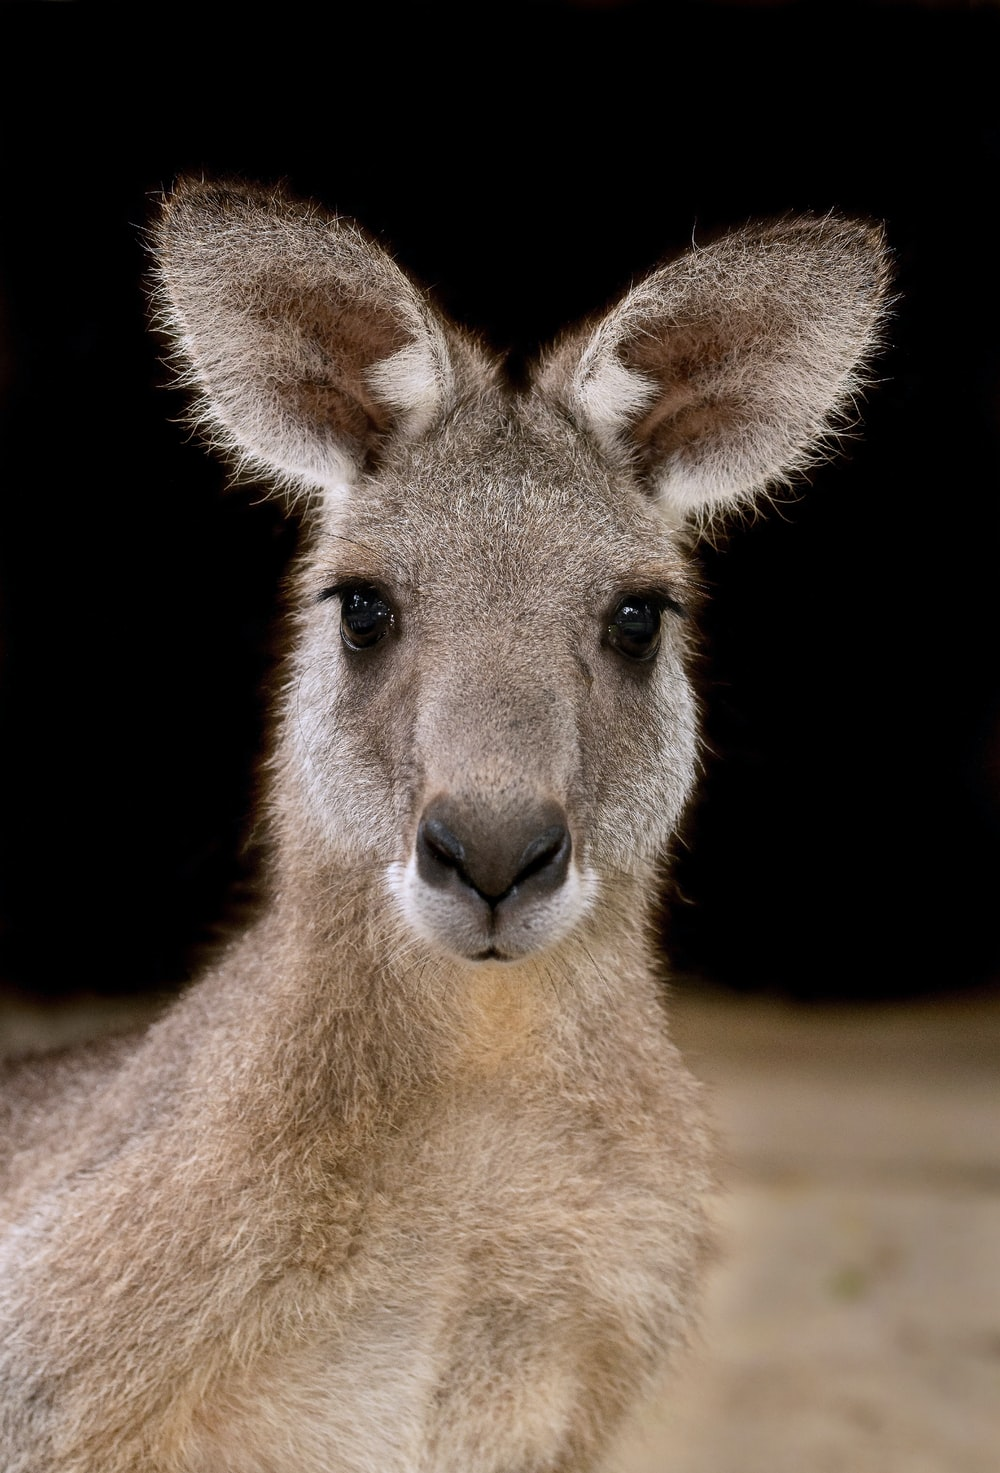 brown kangaroo in black background